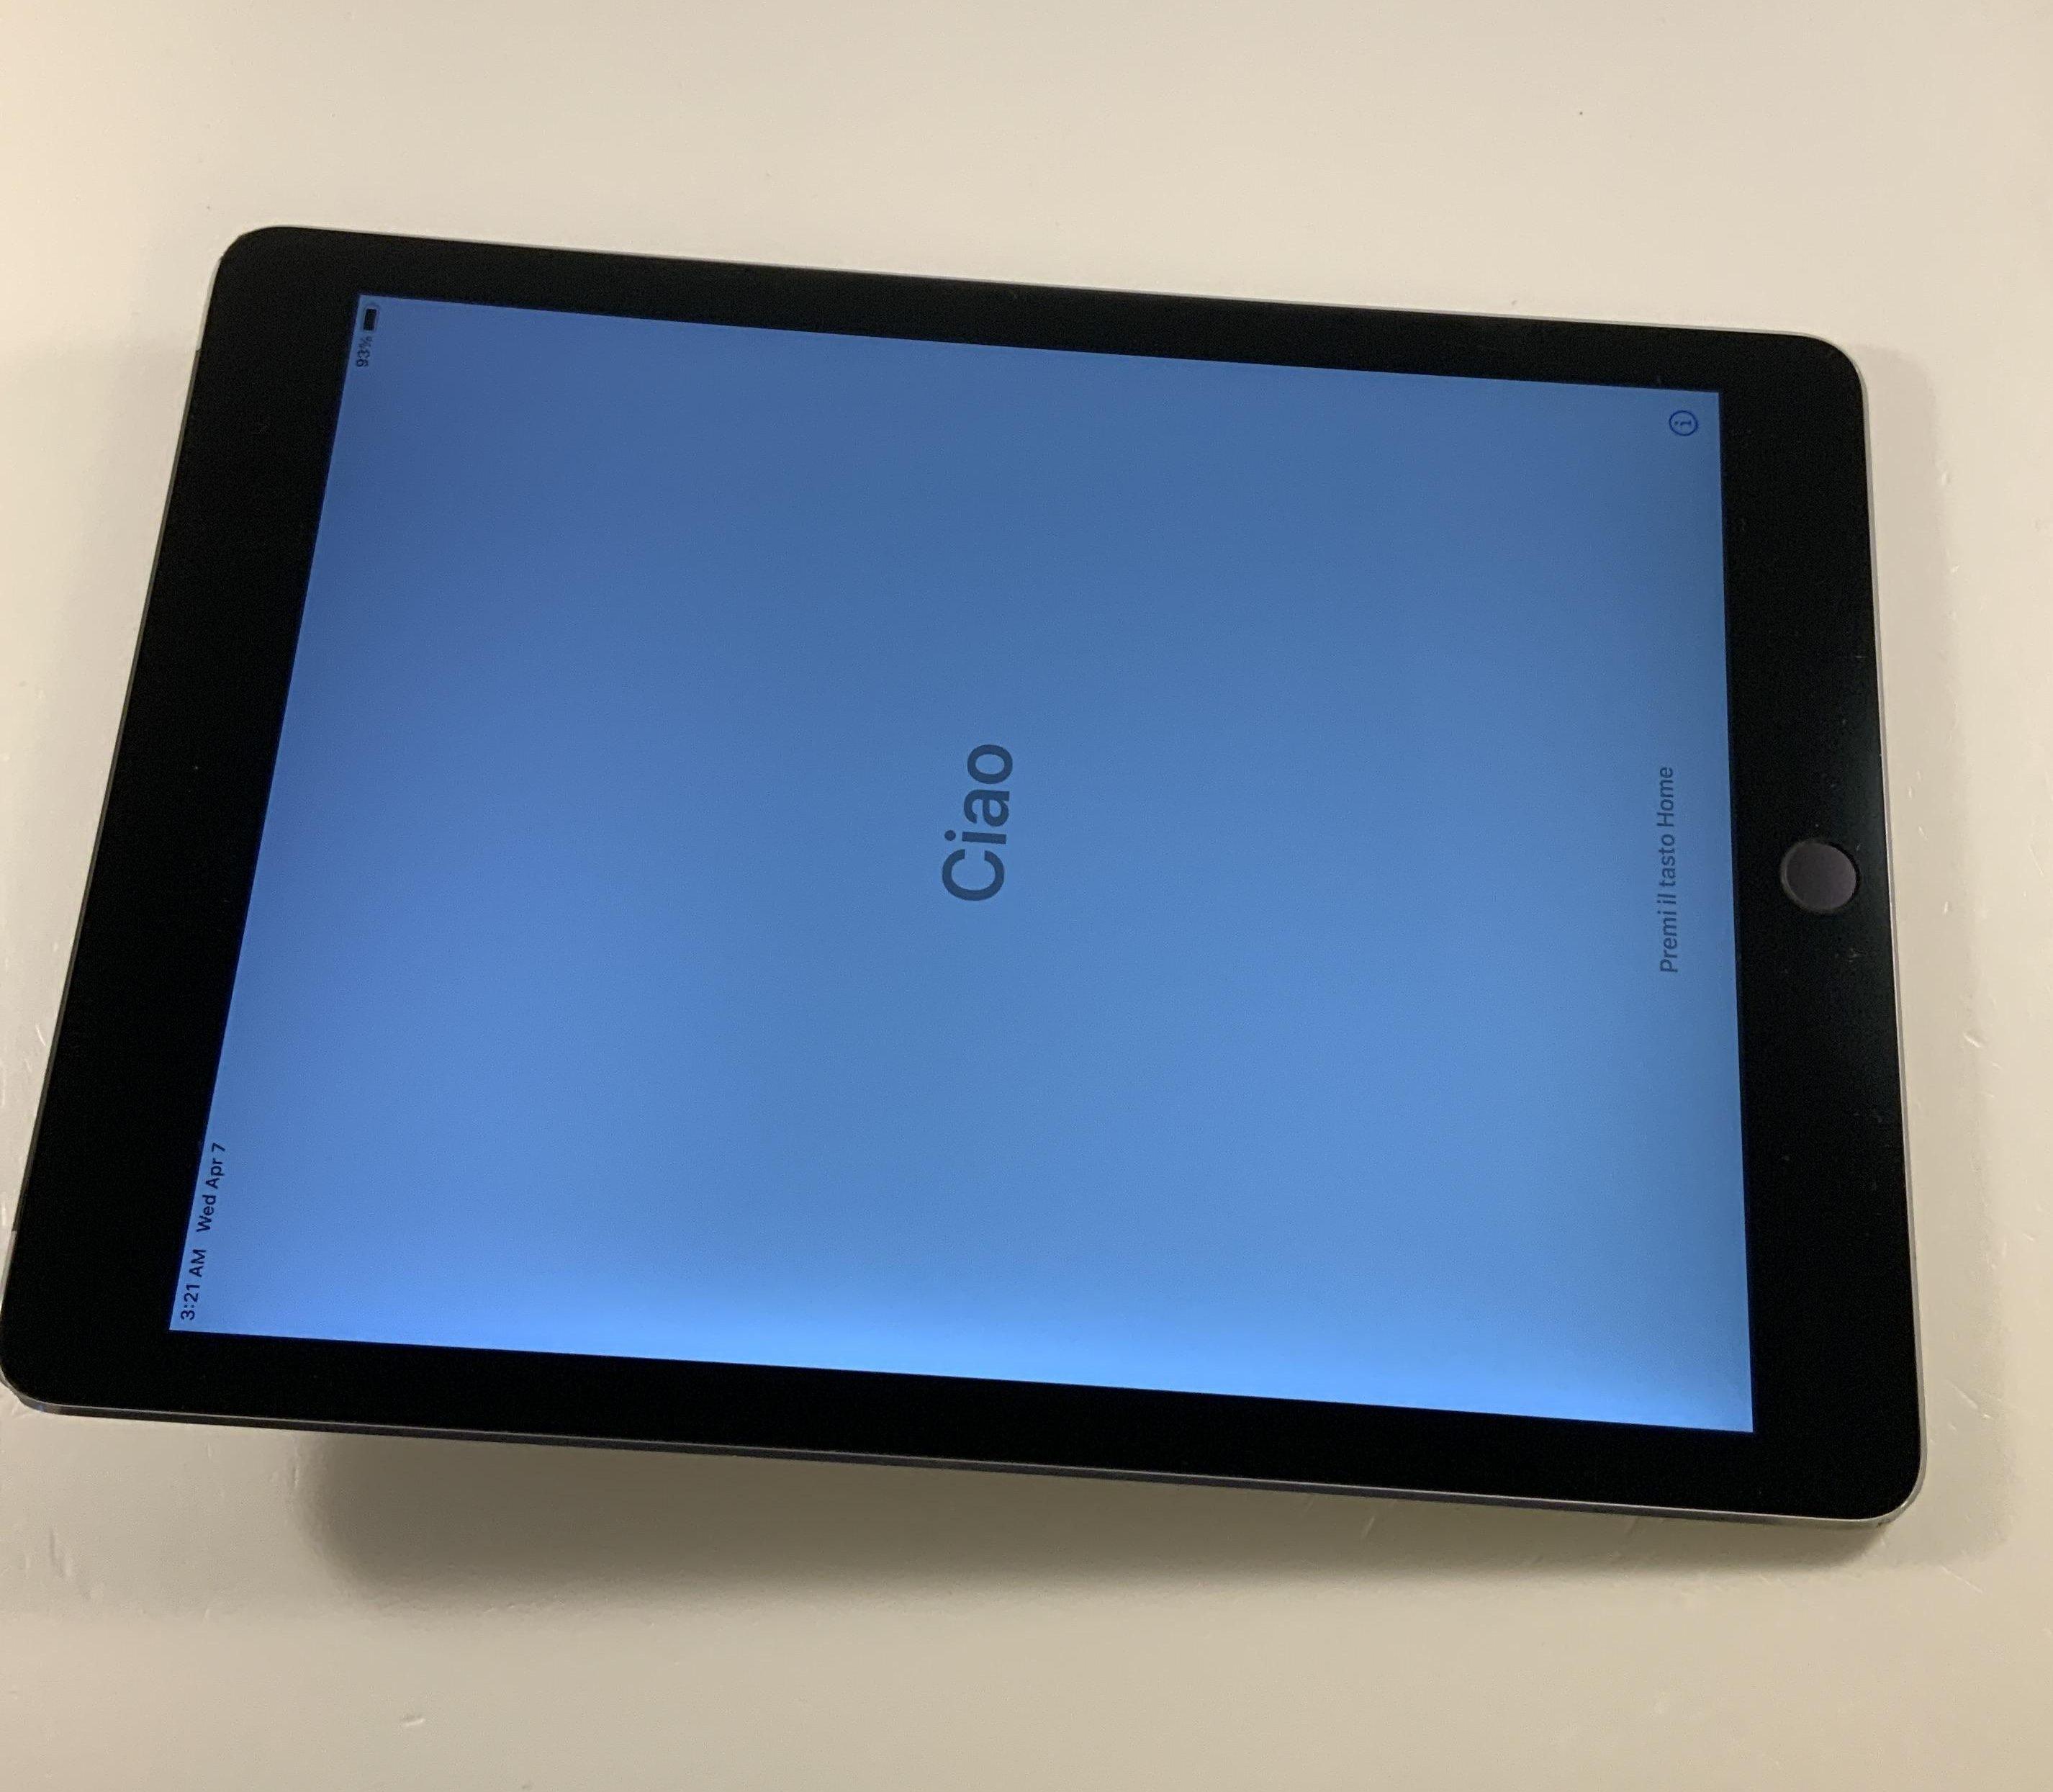 iPad Air 2 Wi-Fi + Cellular 64GB, 64GB, Space Gray, Bild 7